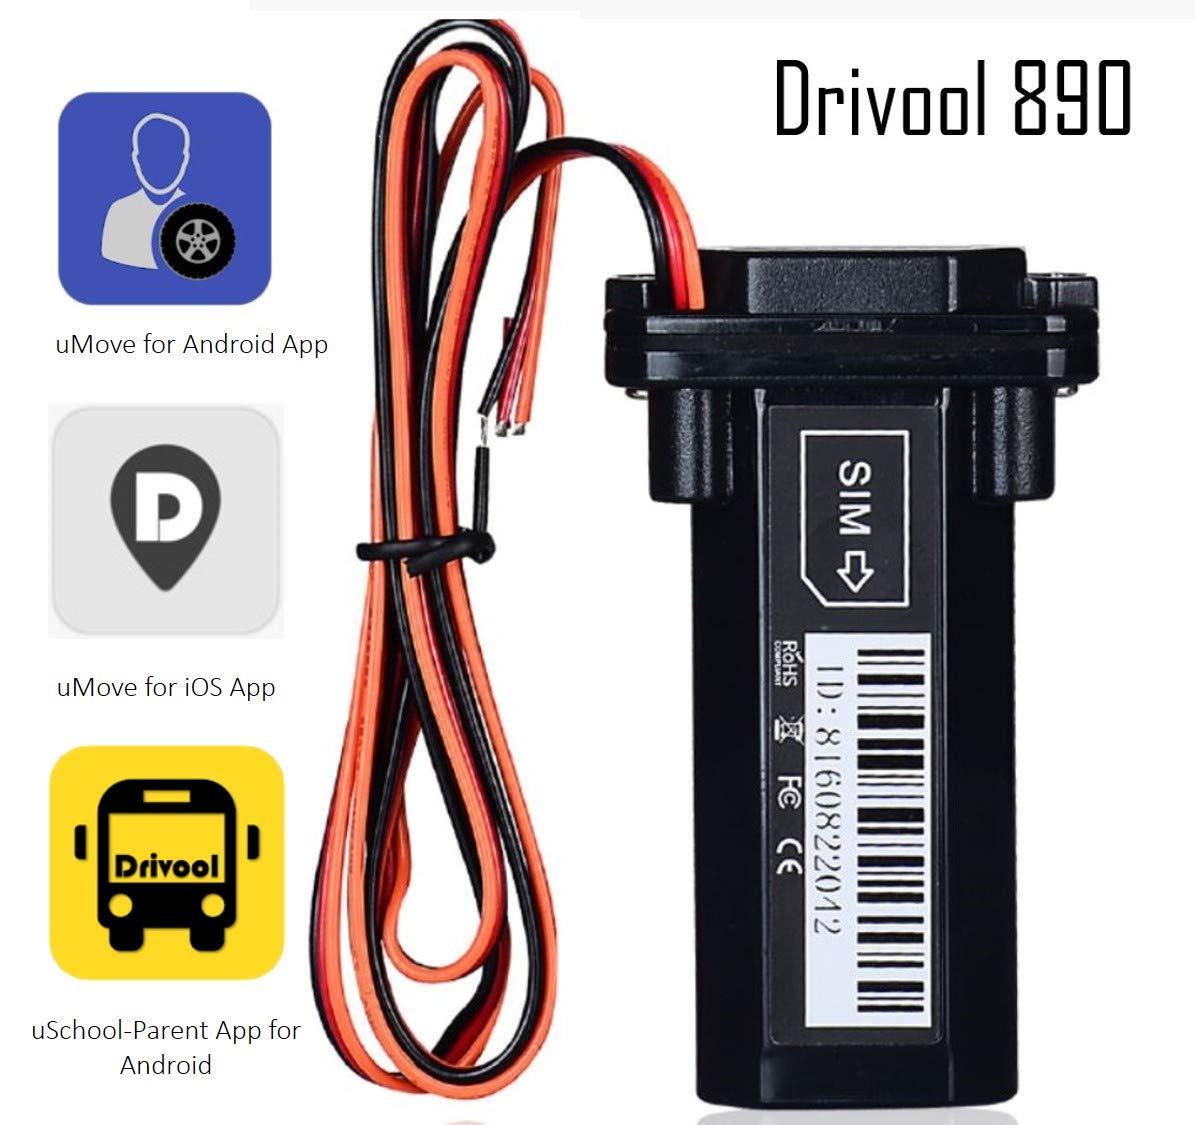 Amazon.com: Drivool ST-901 Sistema de rastreador GPS de ...